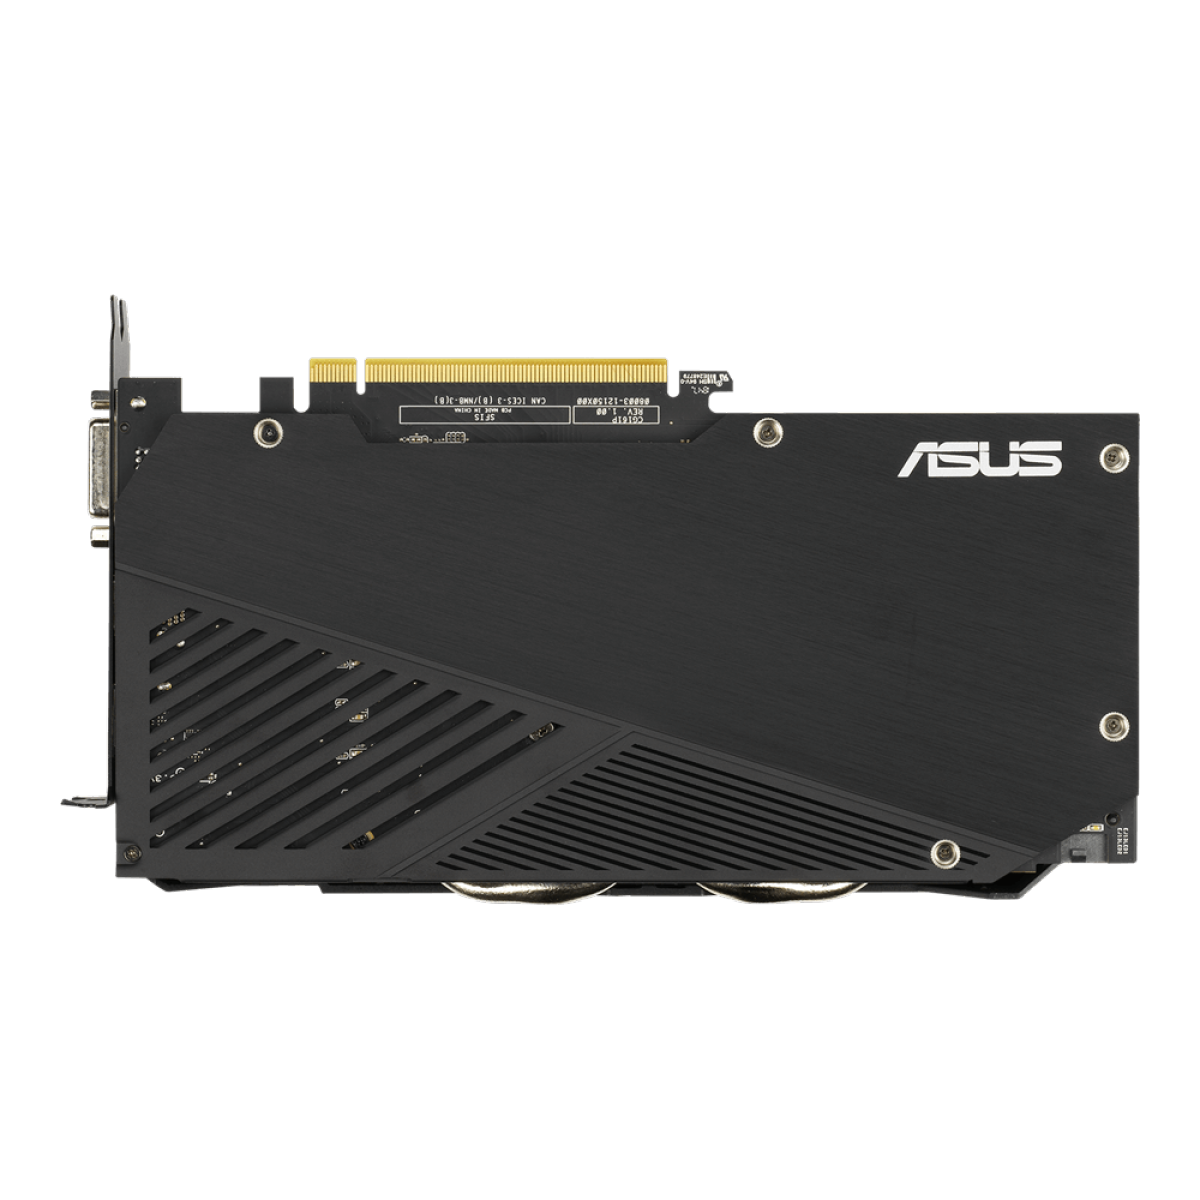 Placa de Vídeo Asus GeForce RTX 2060 Advanced EVO Dual, 6GB, GDDR6, 192bit, DUAL-RTX2060-A6G-EVO